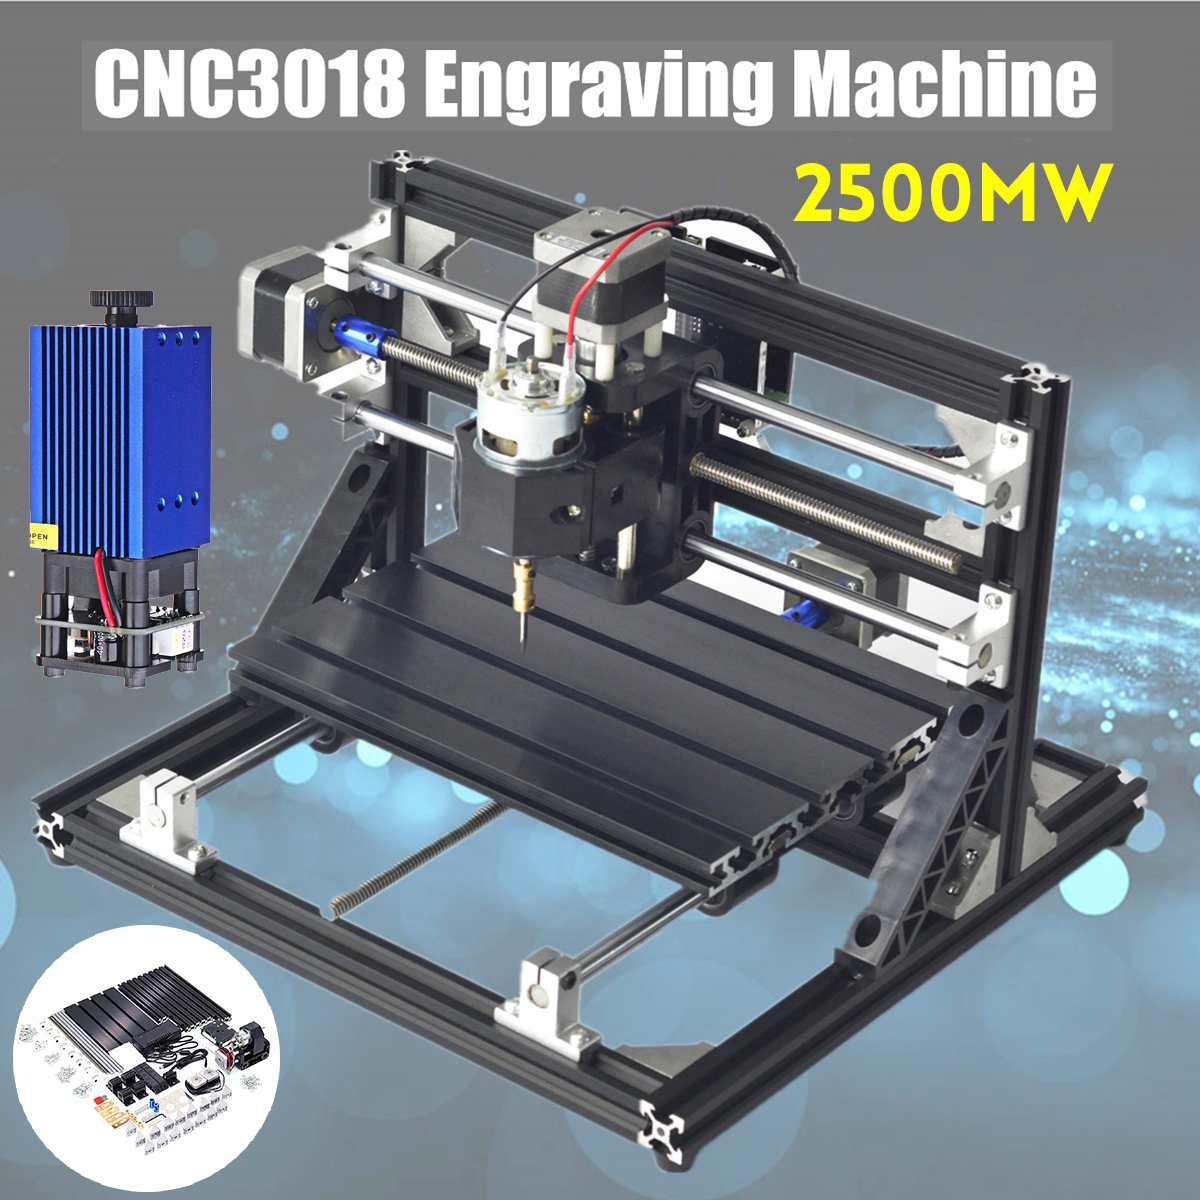 CNC3018 3  Router Spindle Engraver Mini CNC Router DIY Wood Milling Engraving Laser Engraving Machine +2500mW Laser Head